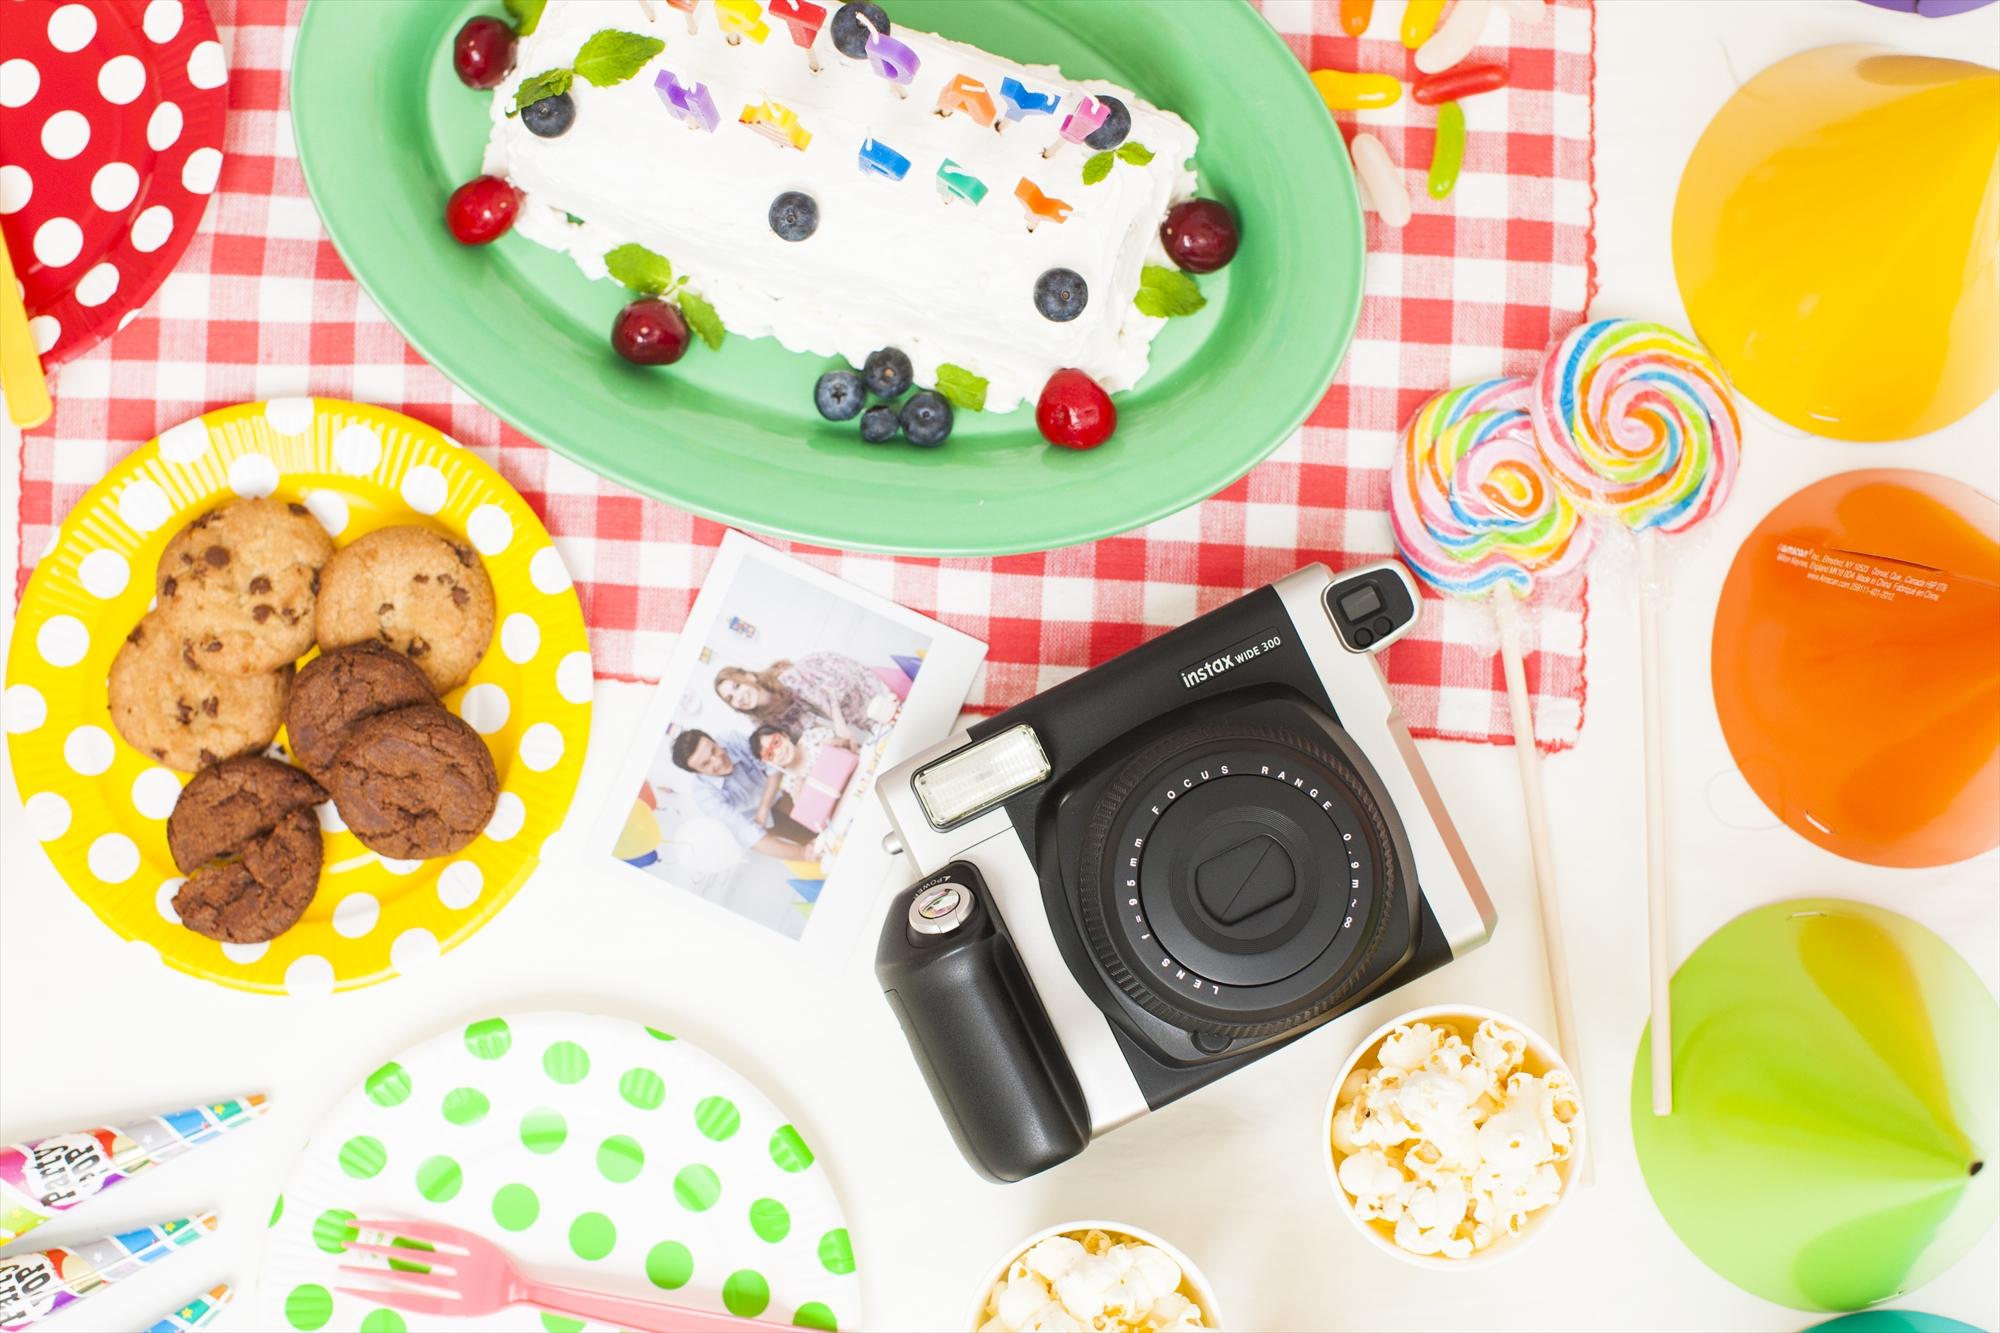 10 tips for shooting better instax photos | Digital Camera World